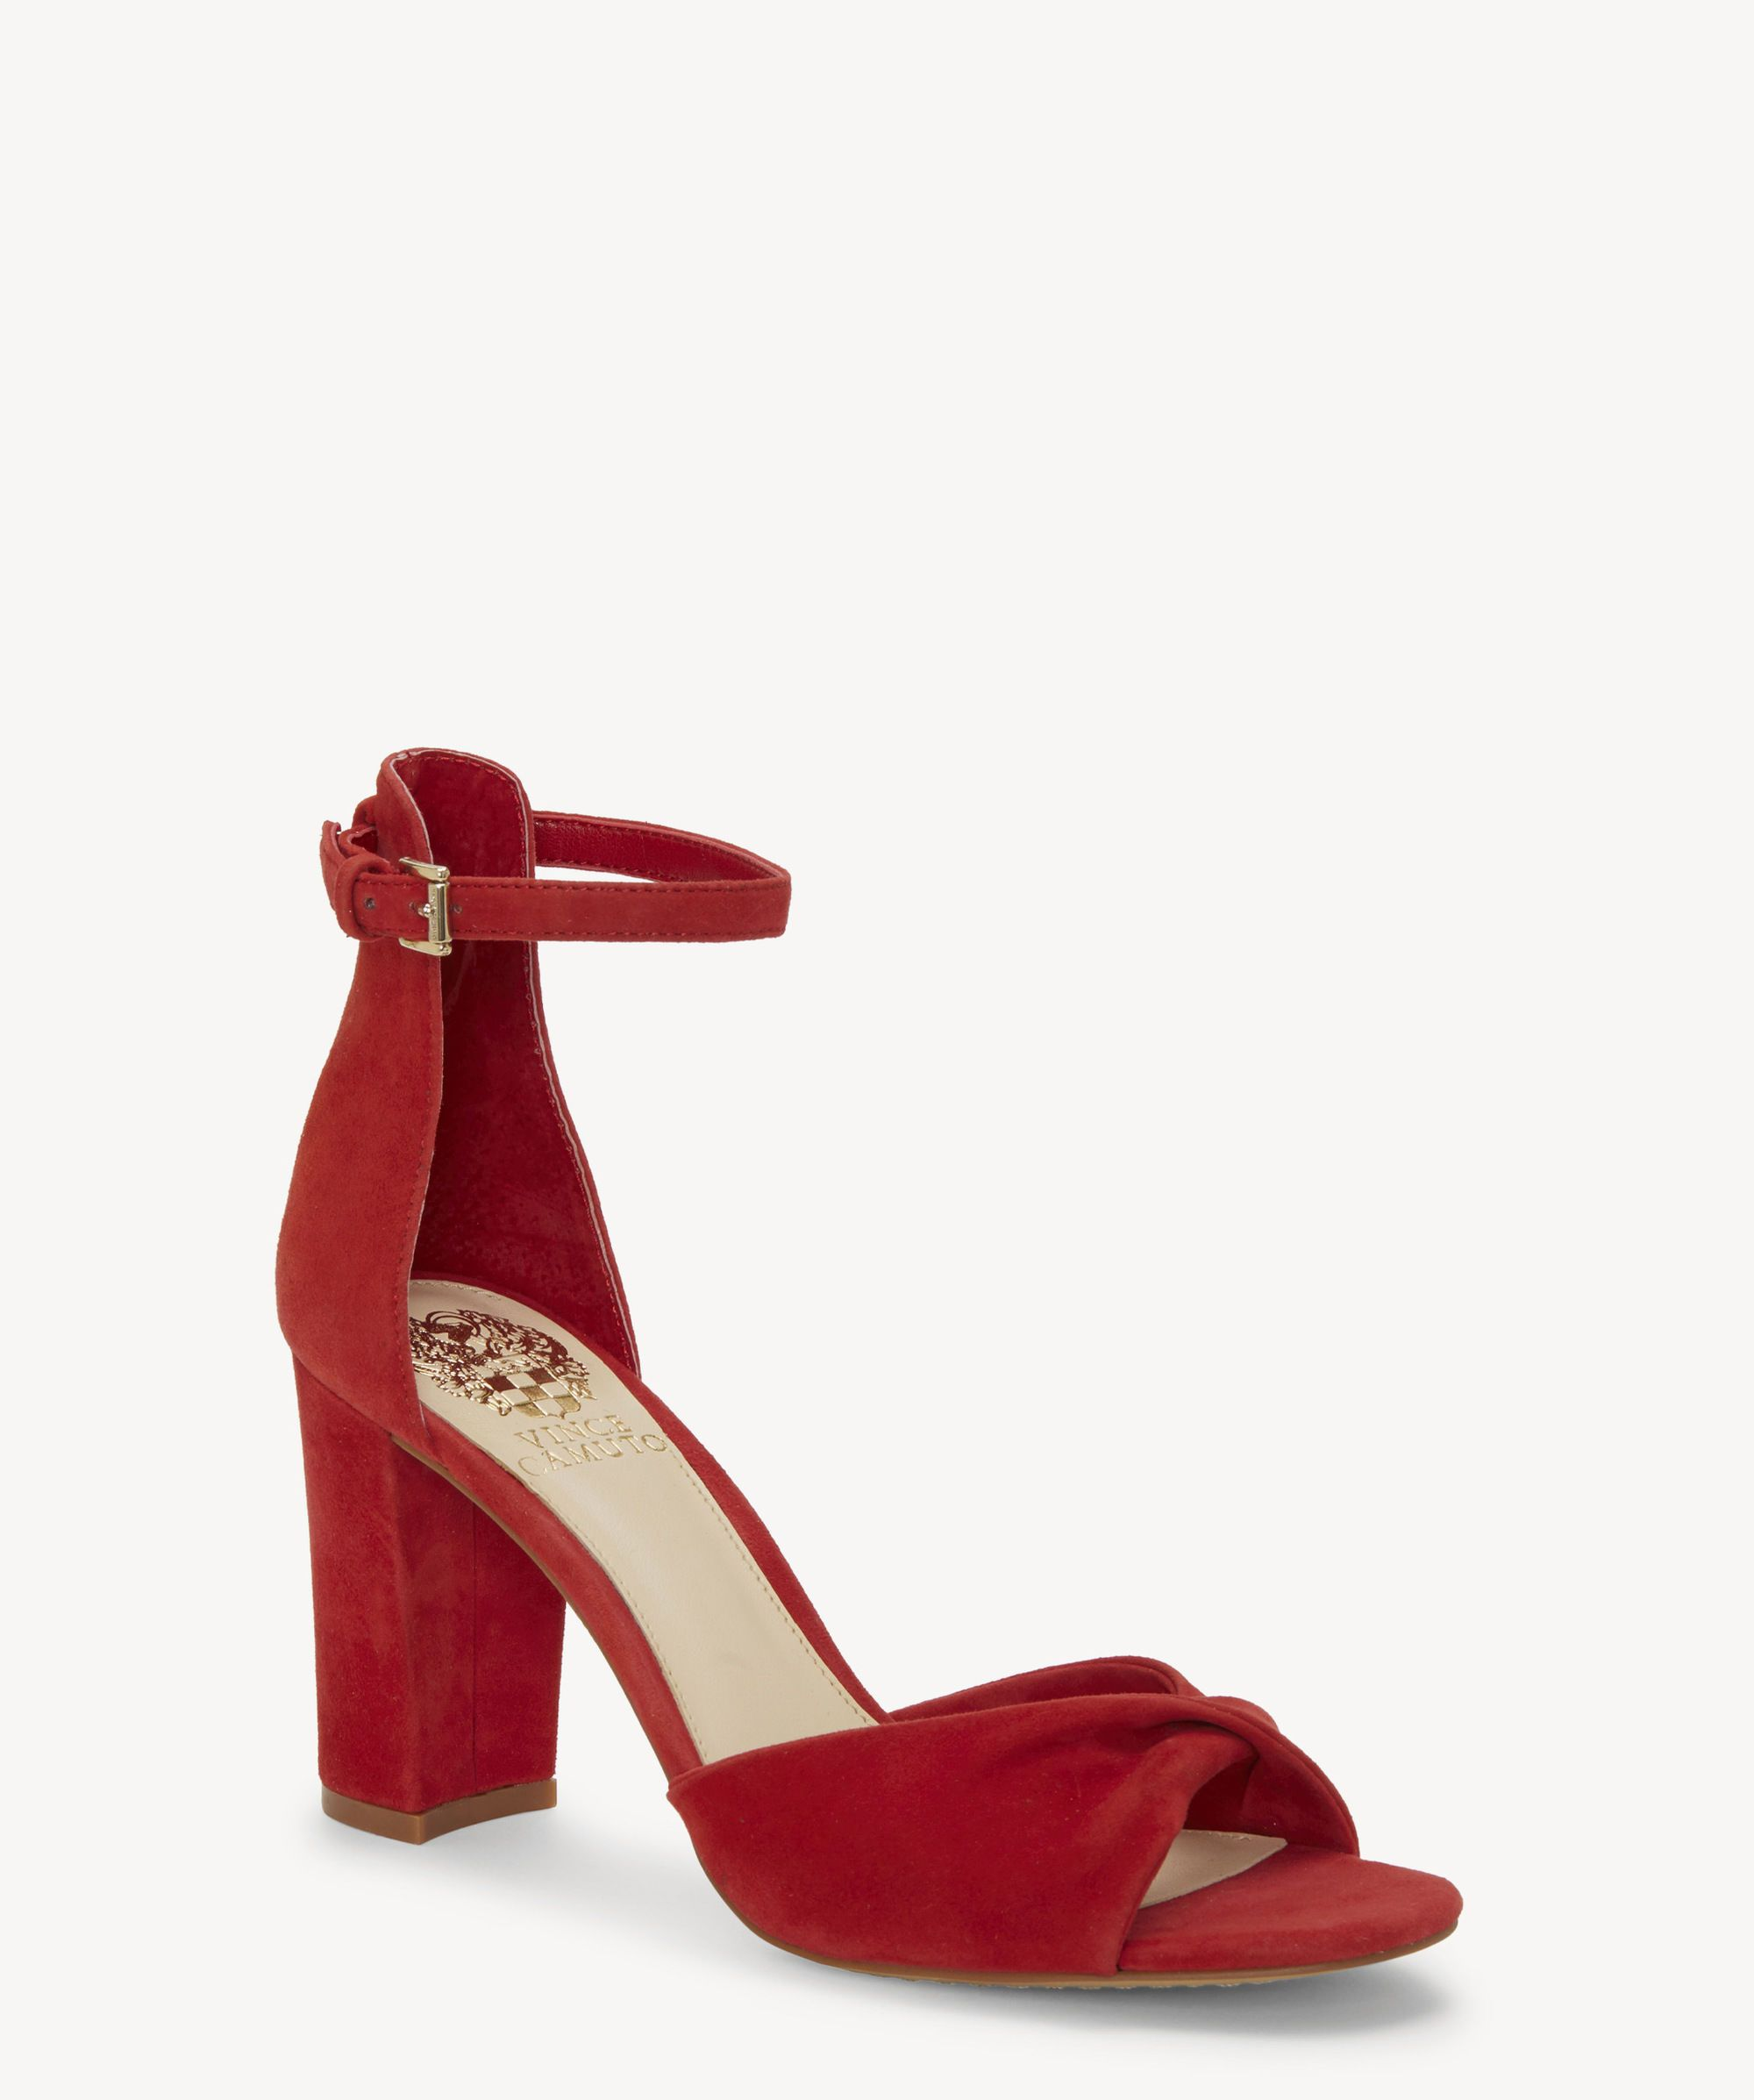 c822a457af84 Wesher in 2019 | Wedding | Vince camuto, Sandals, Leather heels